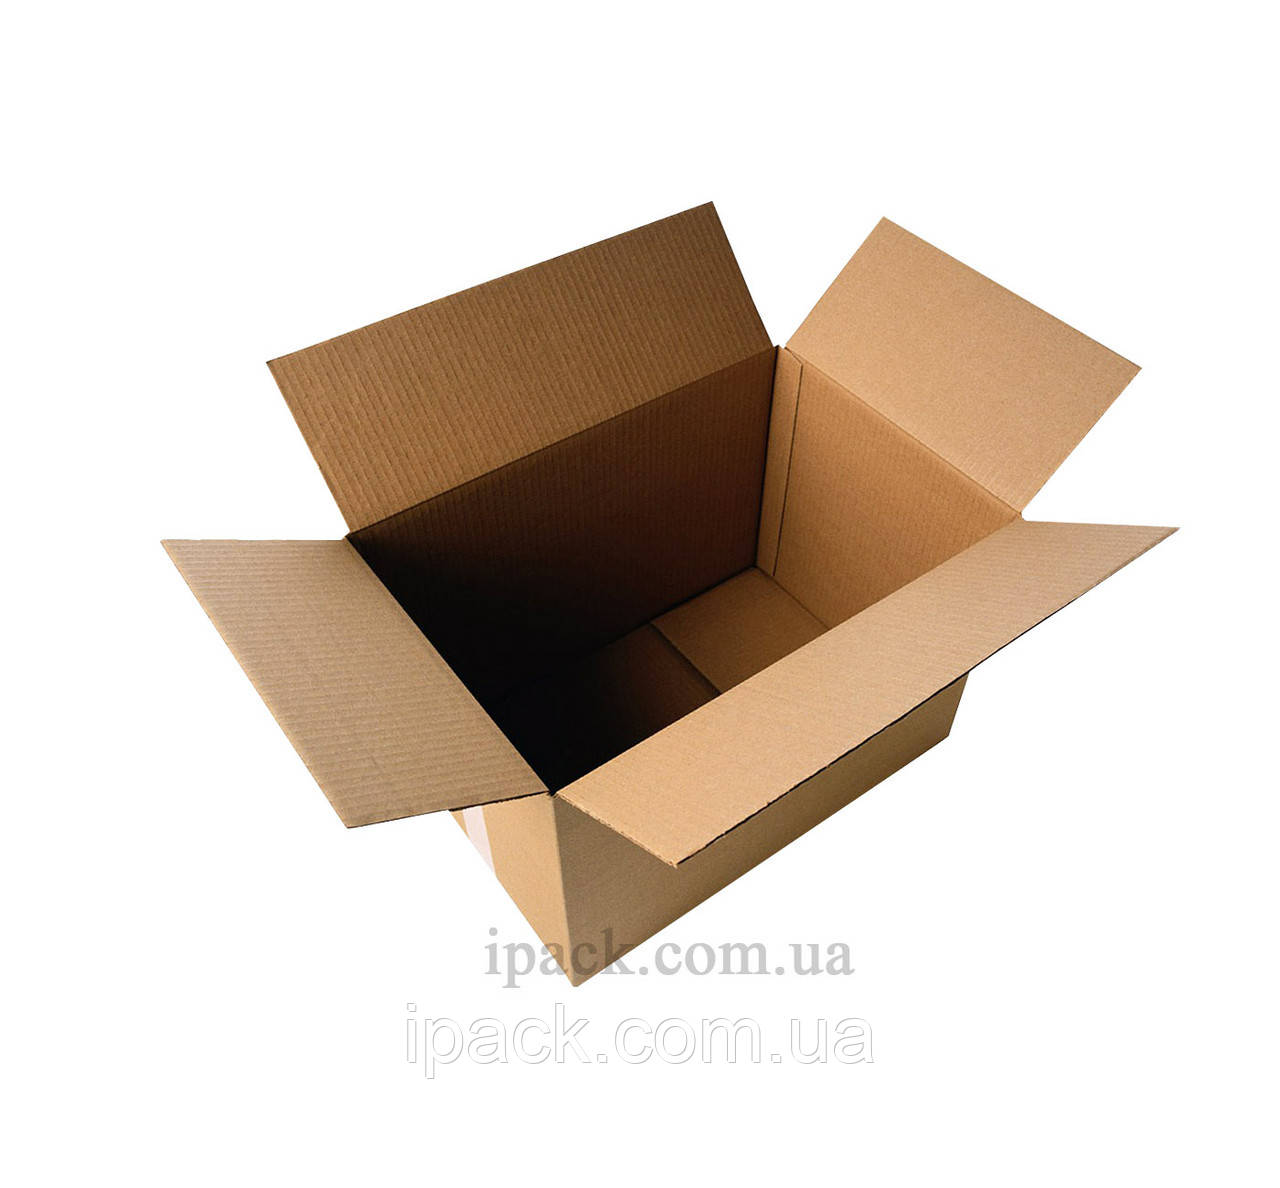 Гофроящик 300*200*130 мм, бурый, четырехклапанный картонный короб